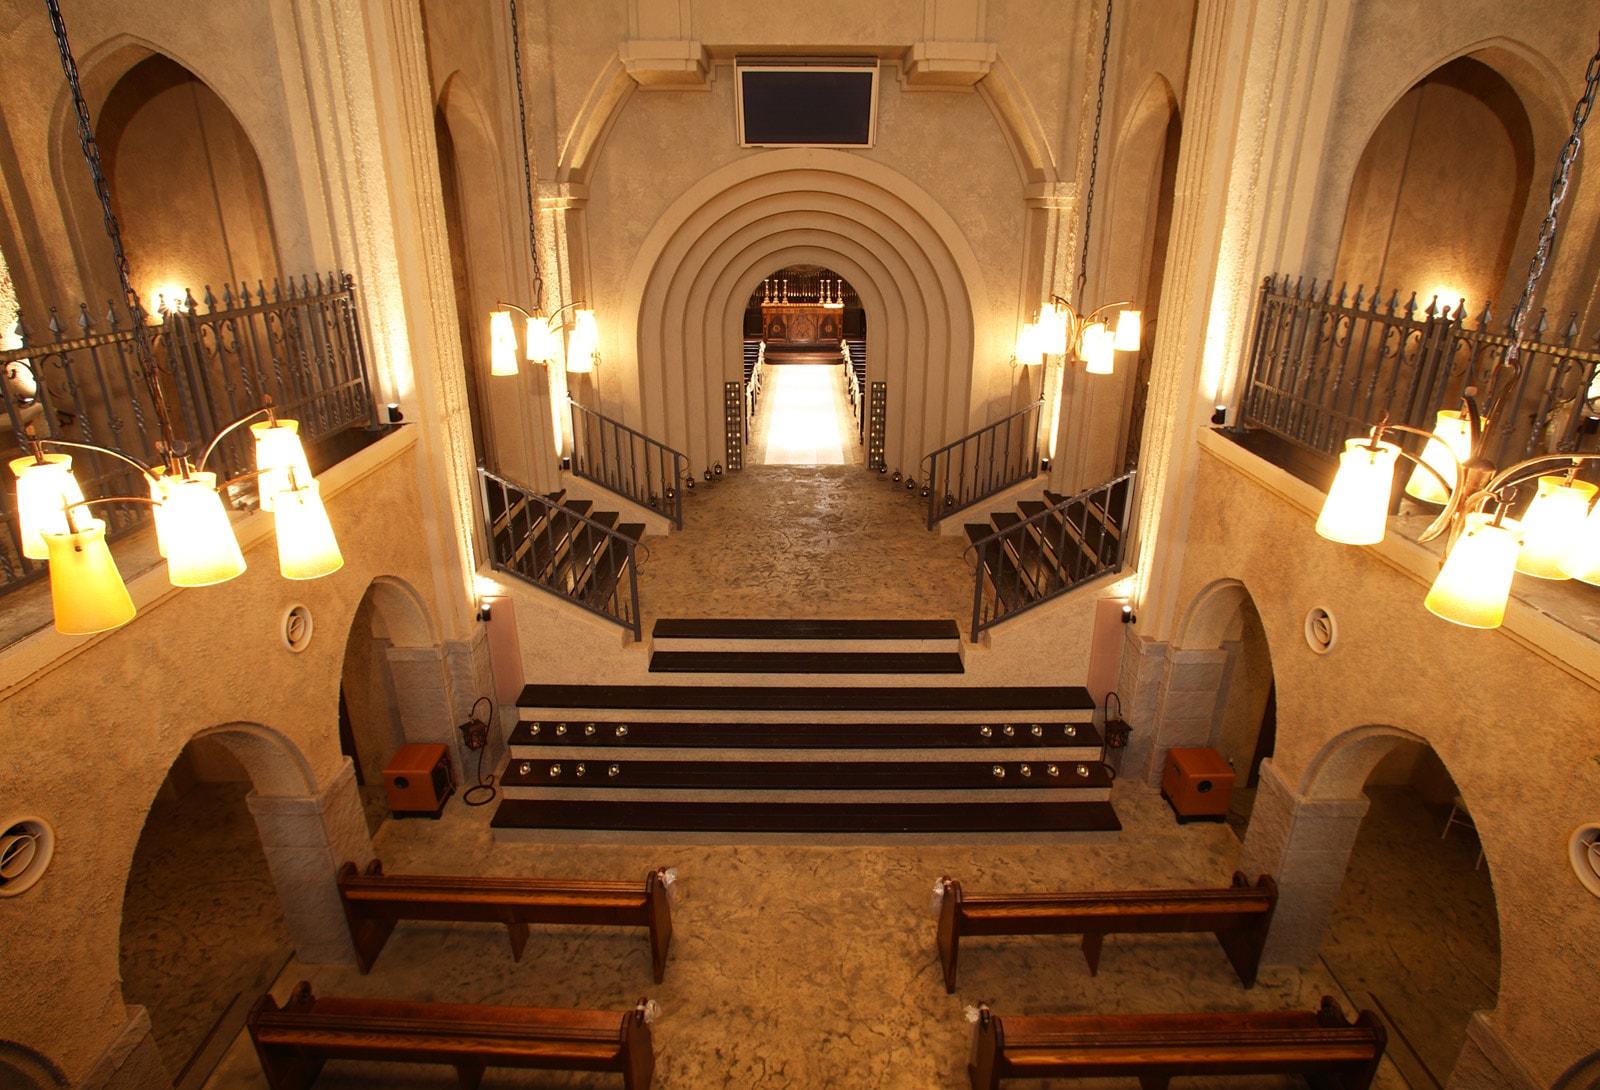 97e656a7cb125 ... 披露宴会場  荘厳な雰囲気の石の教会サンクチュエル大聖堂 ...